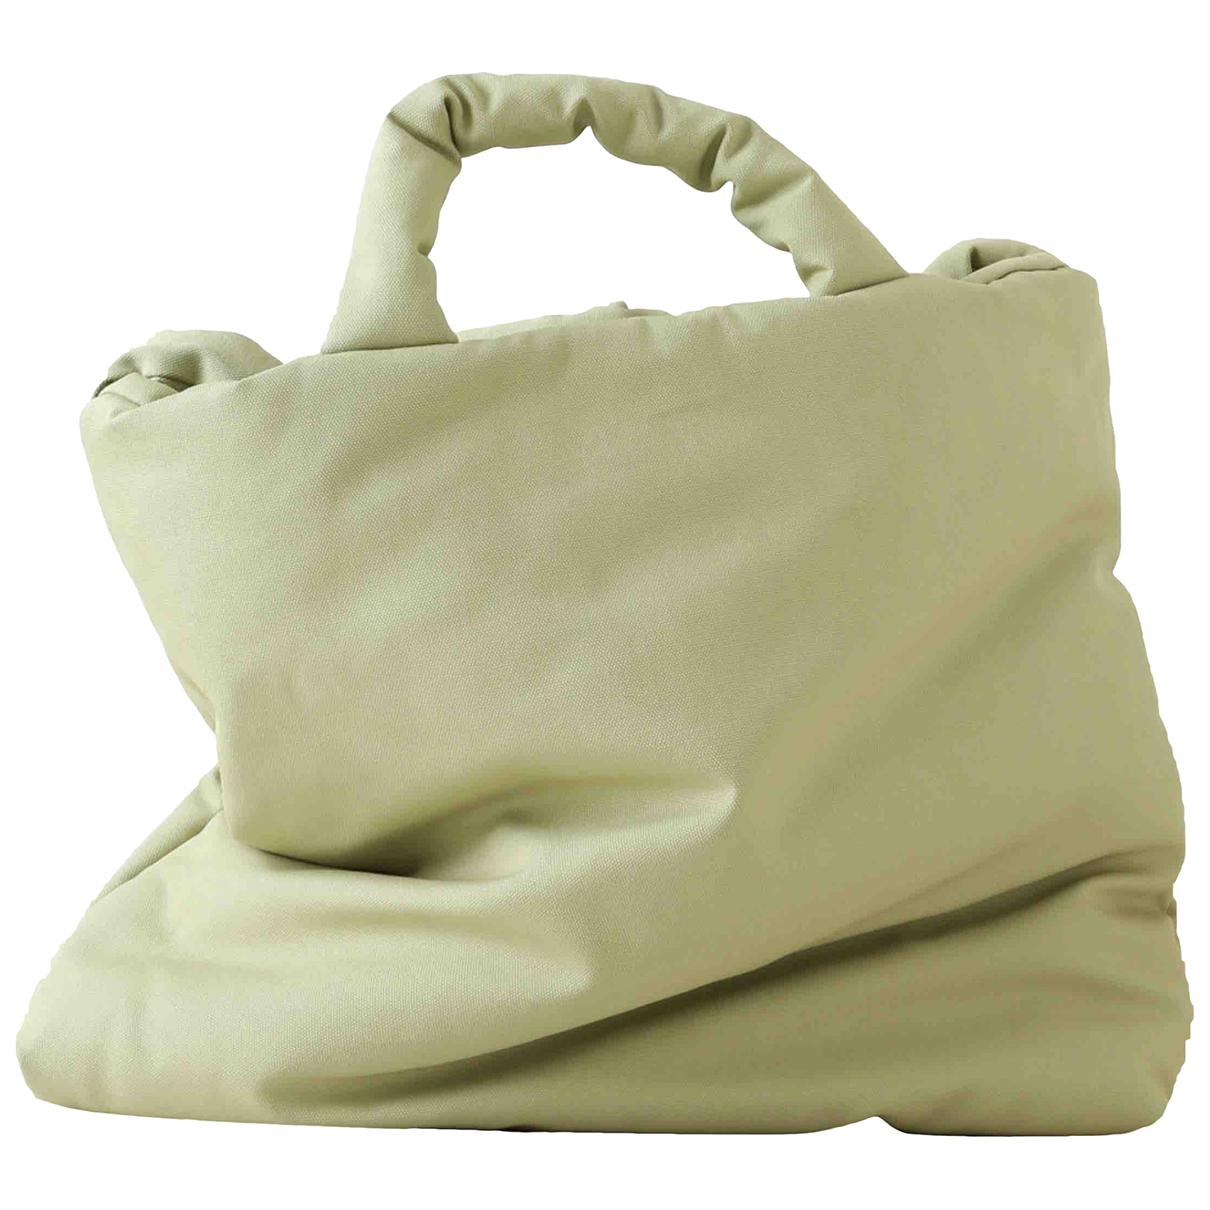 Kassl Editions \N Green Cotton handbag for Women \N